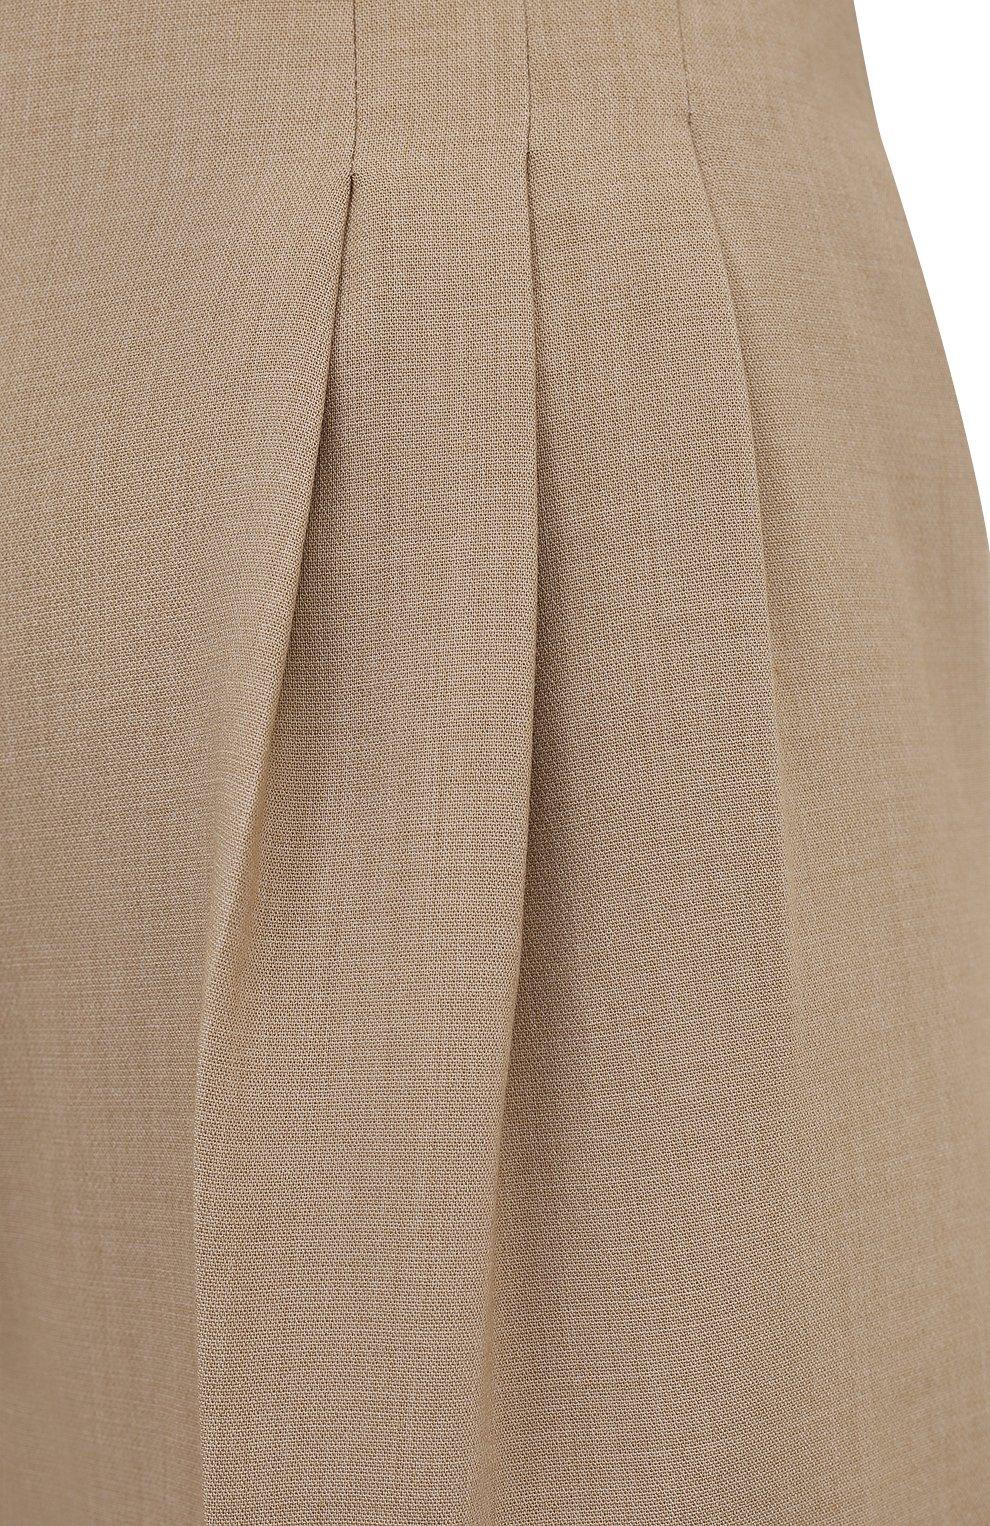 Женские брюки THE FRANKIE SHOP бежевого цвета, арт. PA BSP KR 09/WHEAT | Фото 5